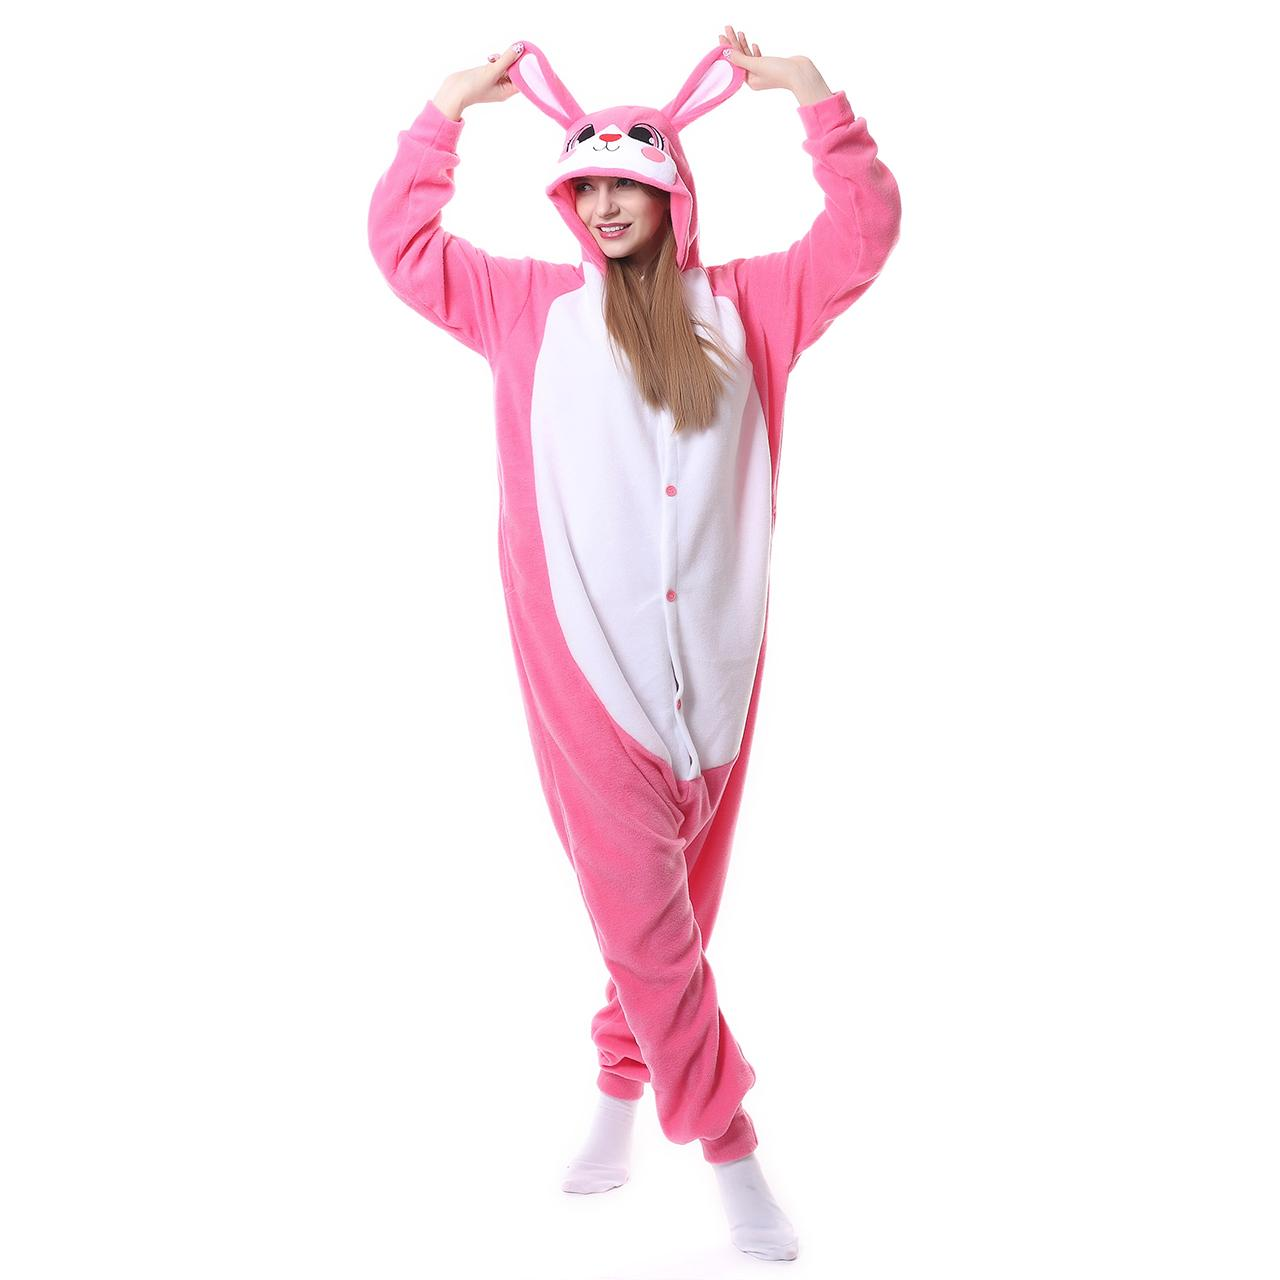 Stuffed Animal Onesie Pajamas For Women Men Pajama Christmas Pink Rabbit Pyjamas Fleece Cartoon Adult Cosplay Costume 2018 New Fashion Style Kids Halloween ...  sc 1 st  DHgate.com & Stuffed Animal Onesie Pajamas For Women Men Pajama Christmas Pink ...